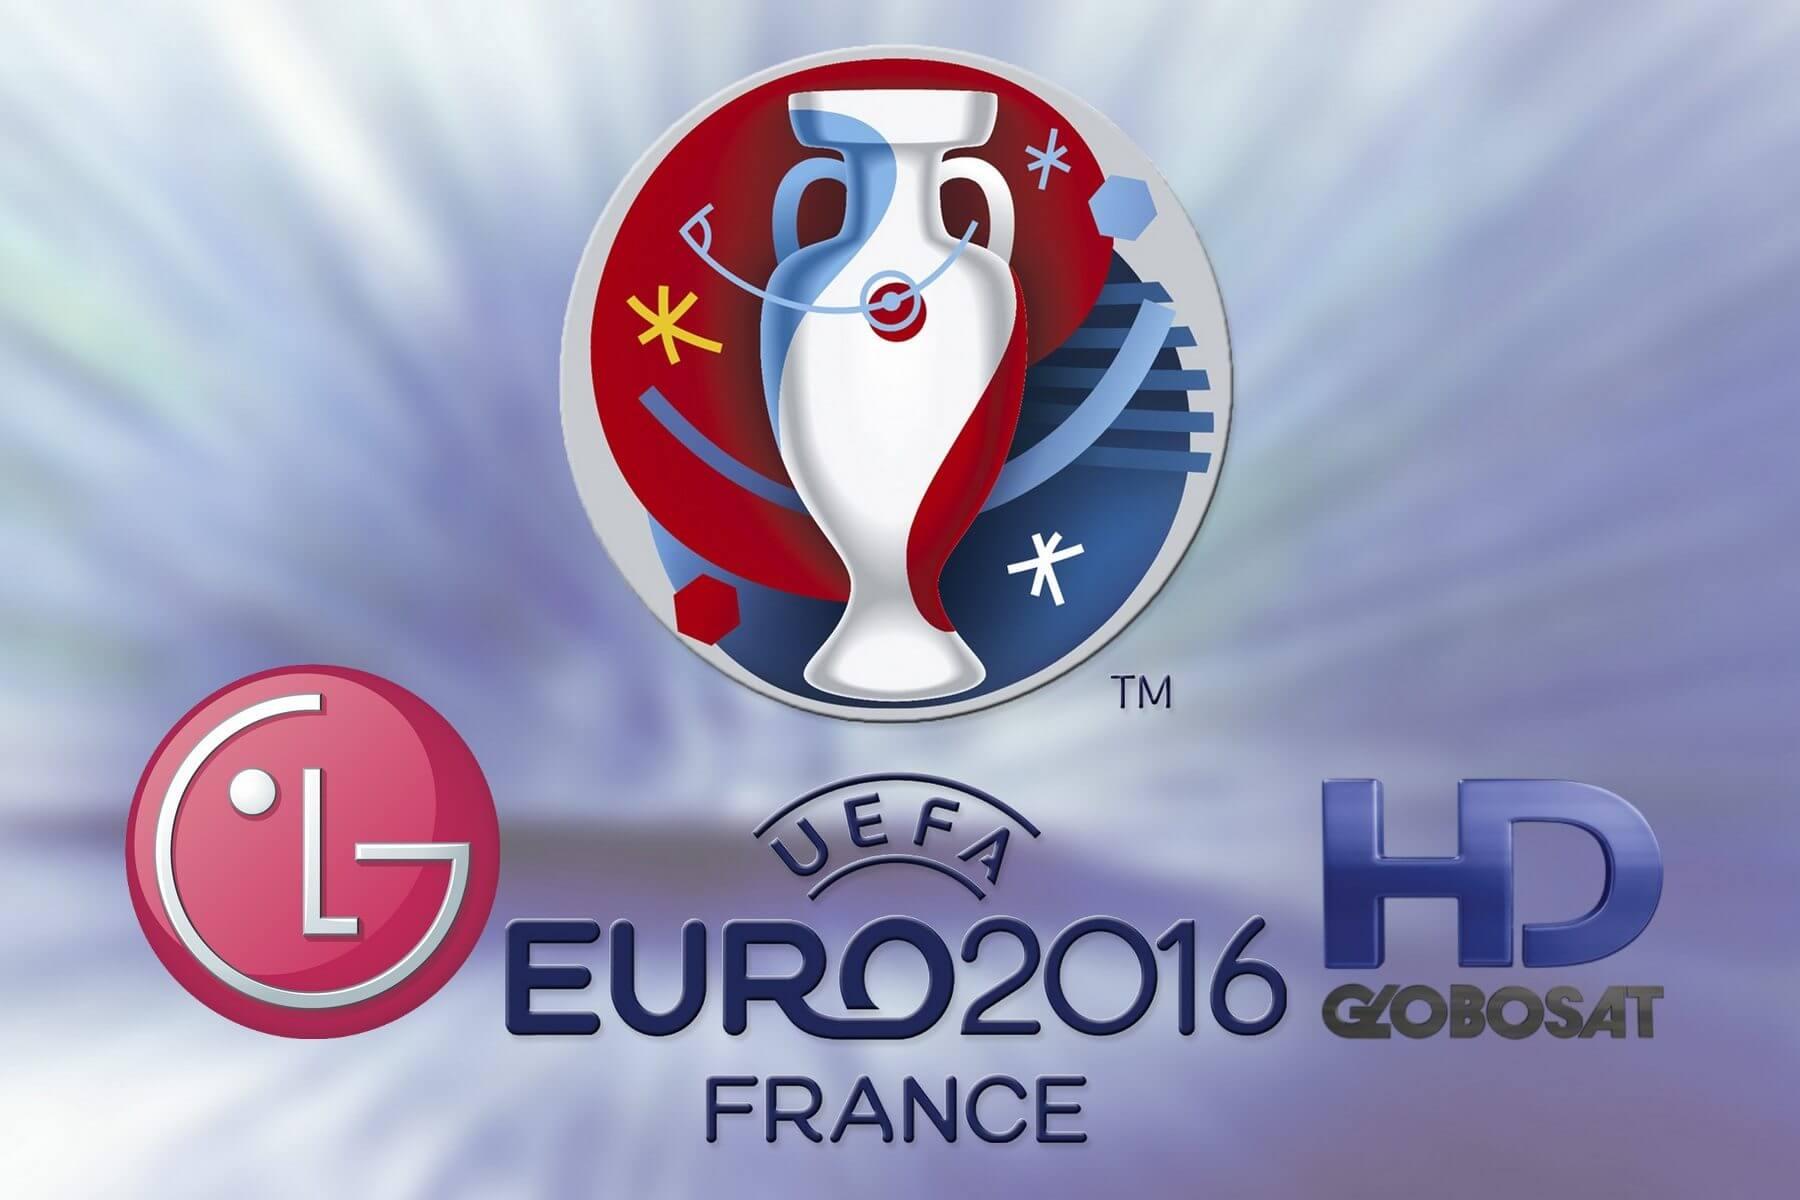 Smt uefaeuro2016 capa